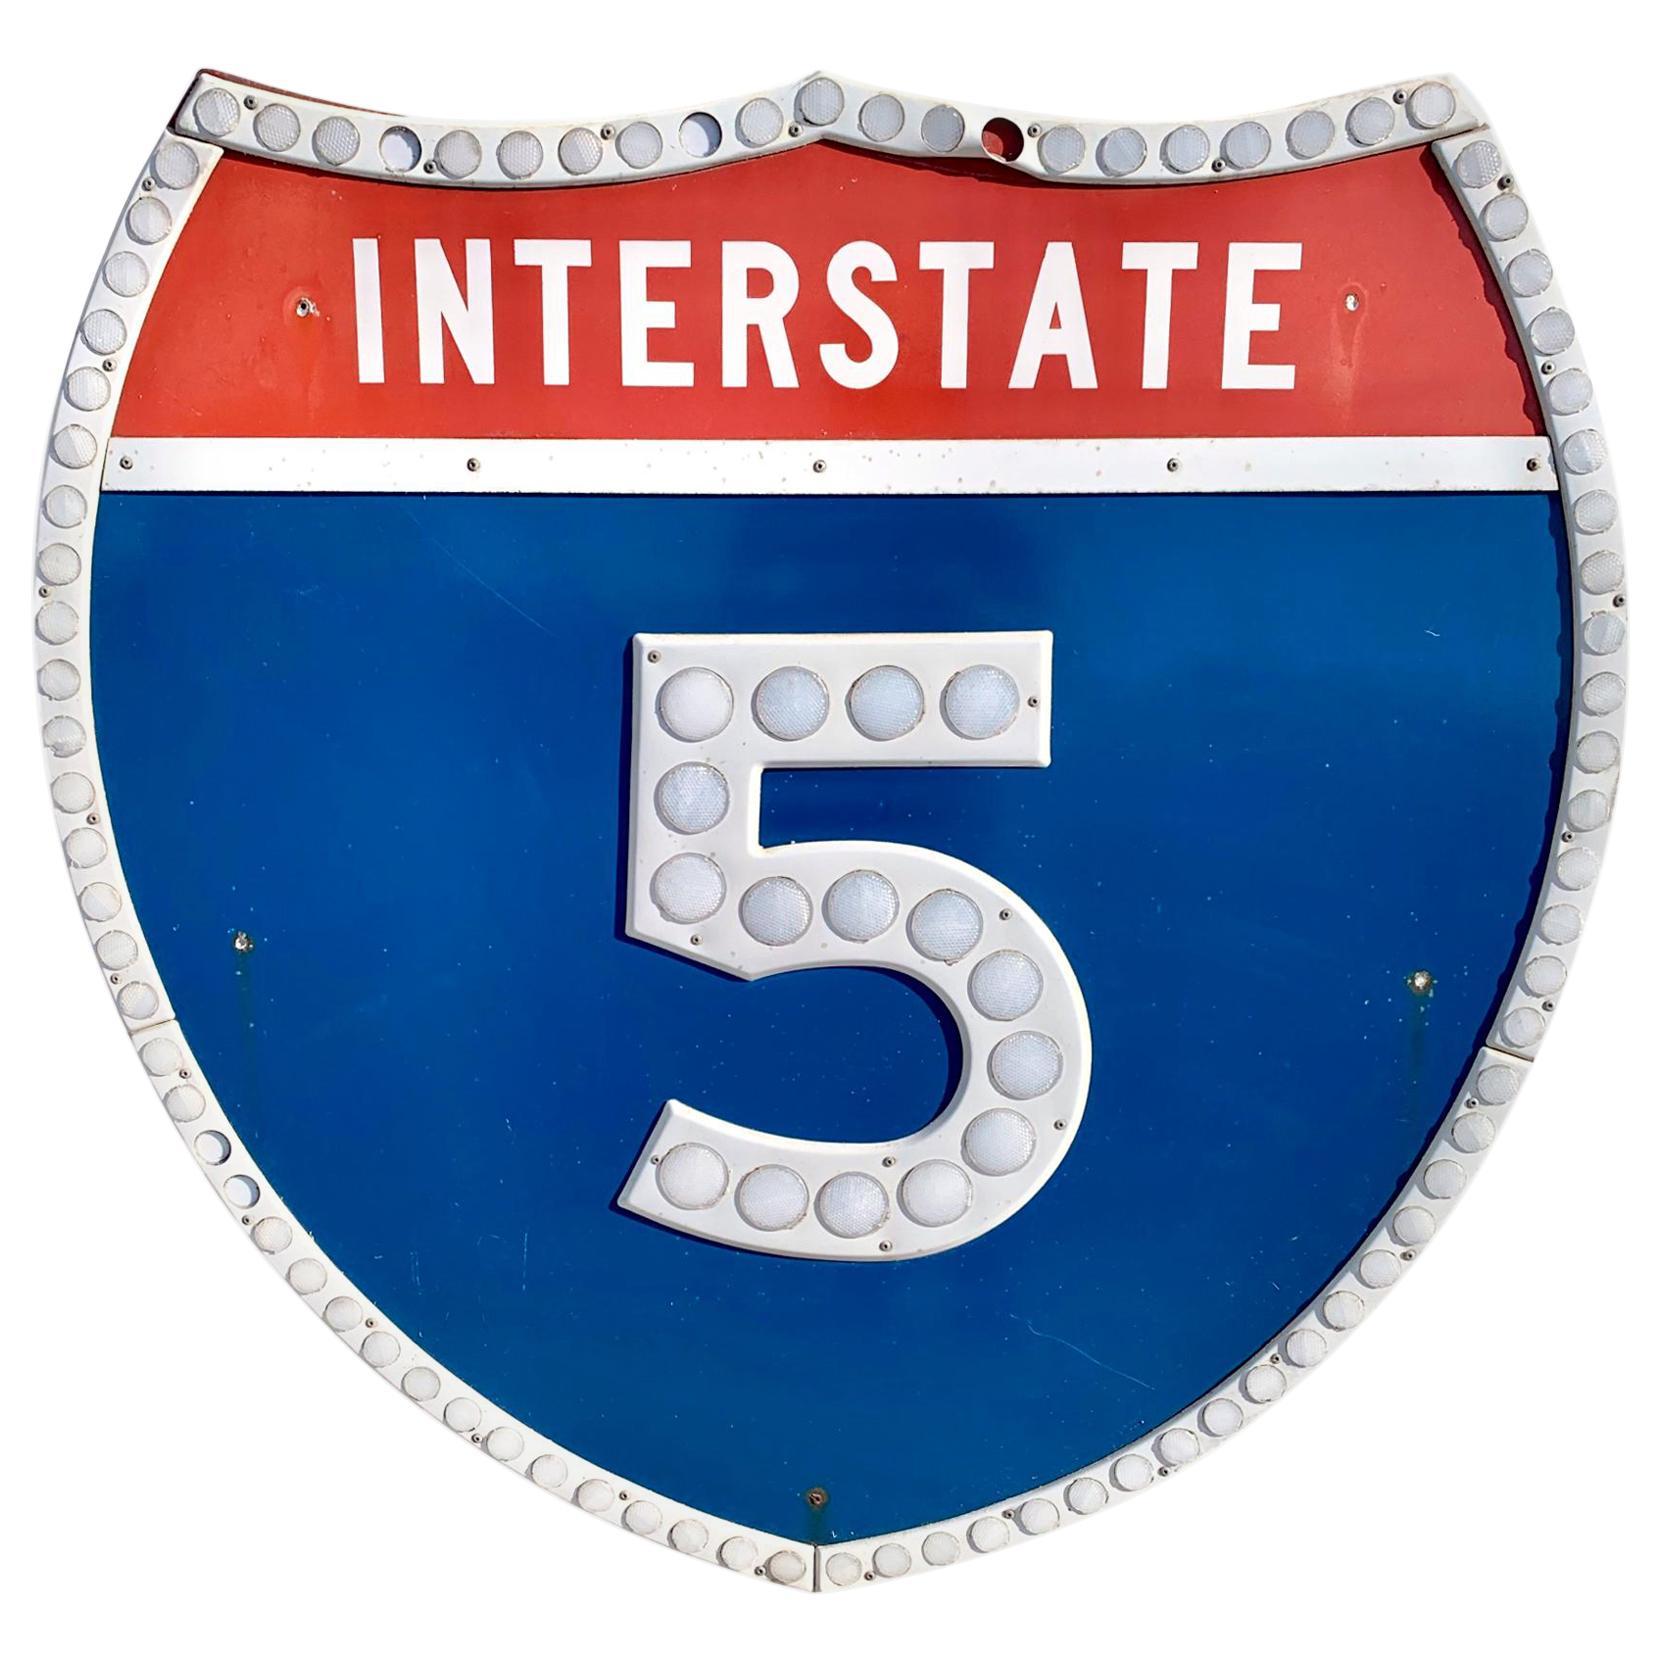 Los Angeles 5 Freeway Shield